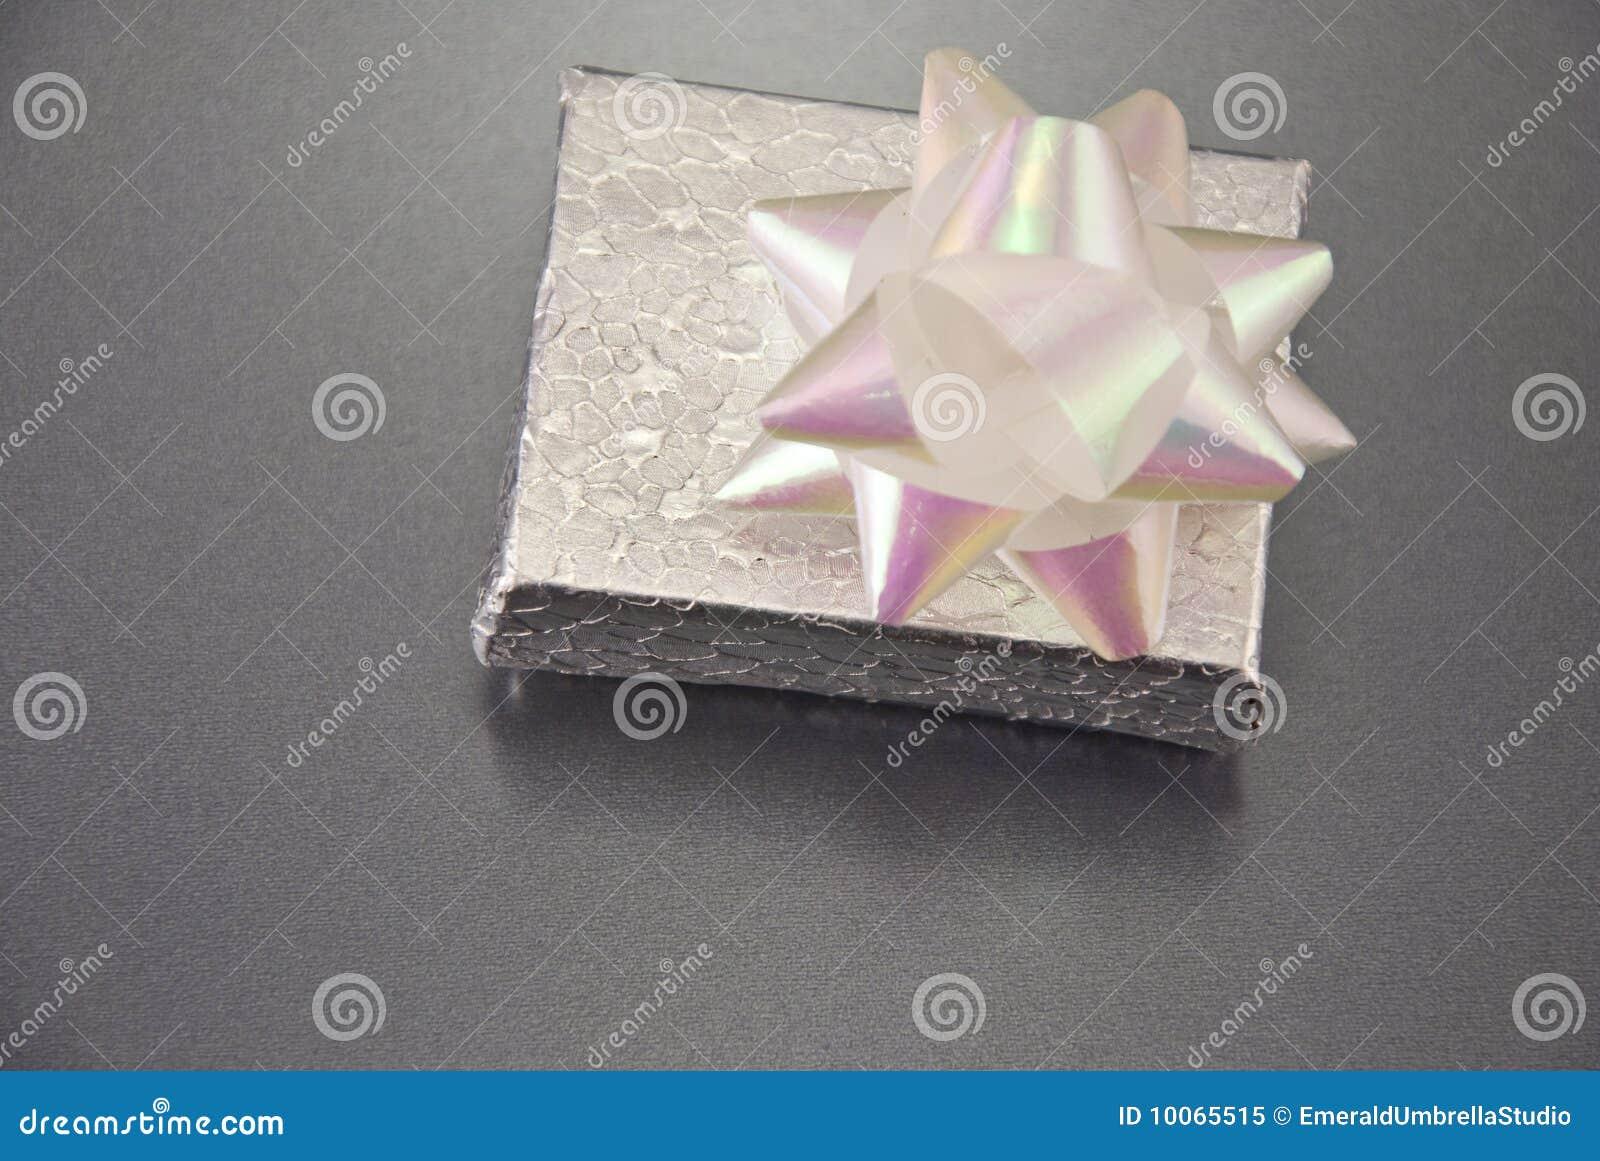 Presente fechado da prata